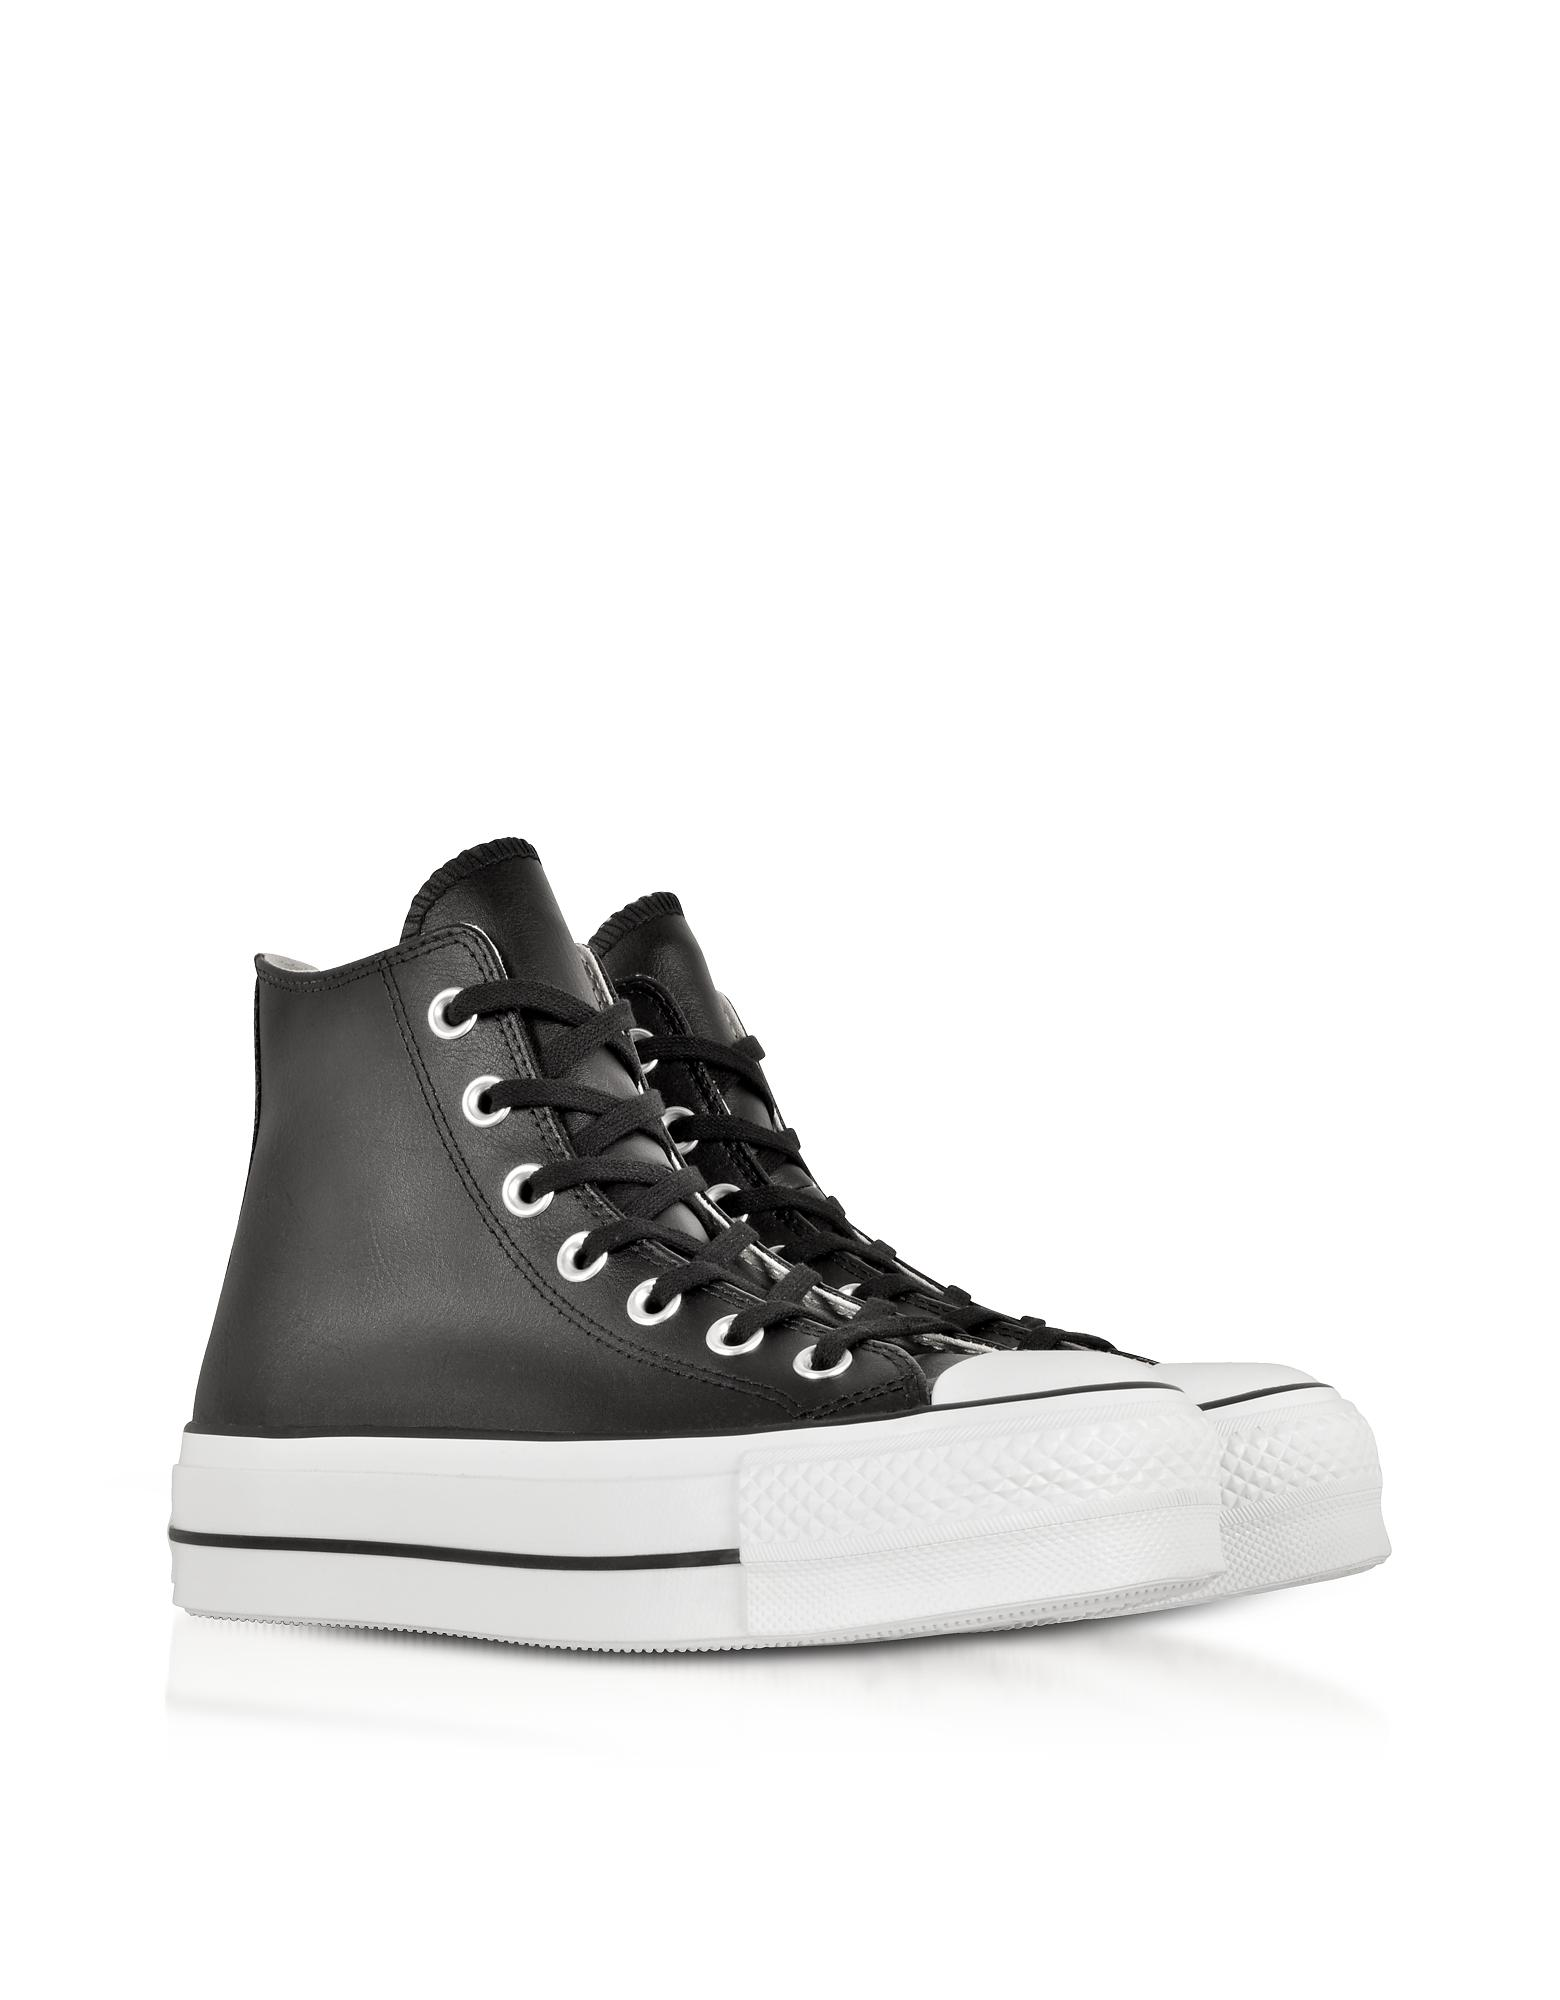 d997b907abd0 Converse Chuck Taylor All Star Lift Clean Black Leather High Top ...